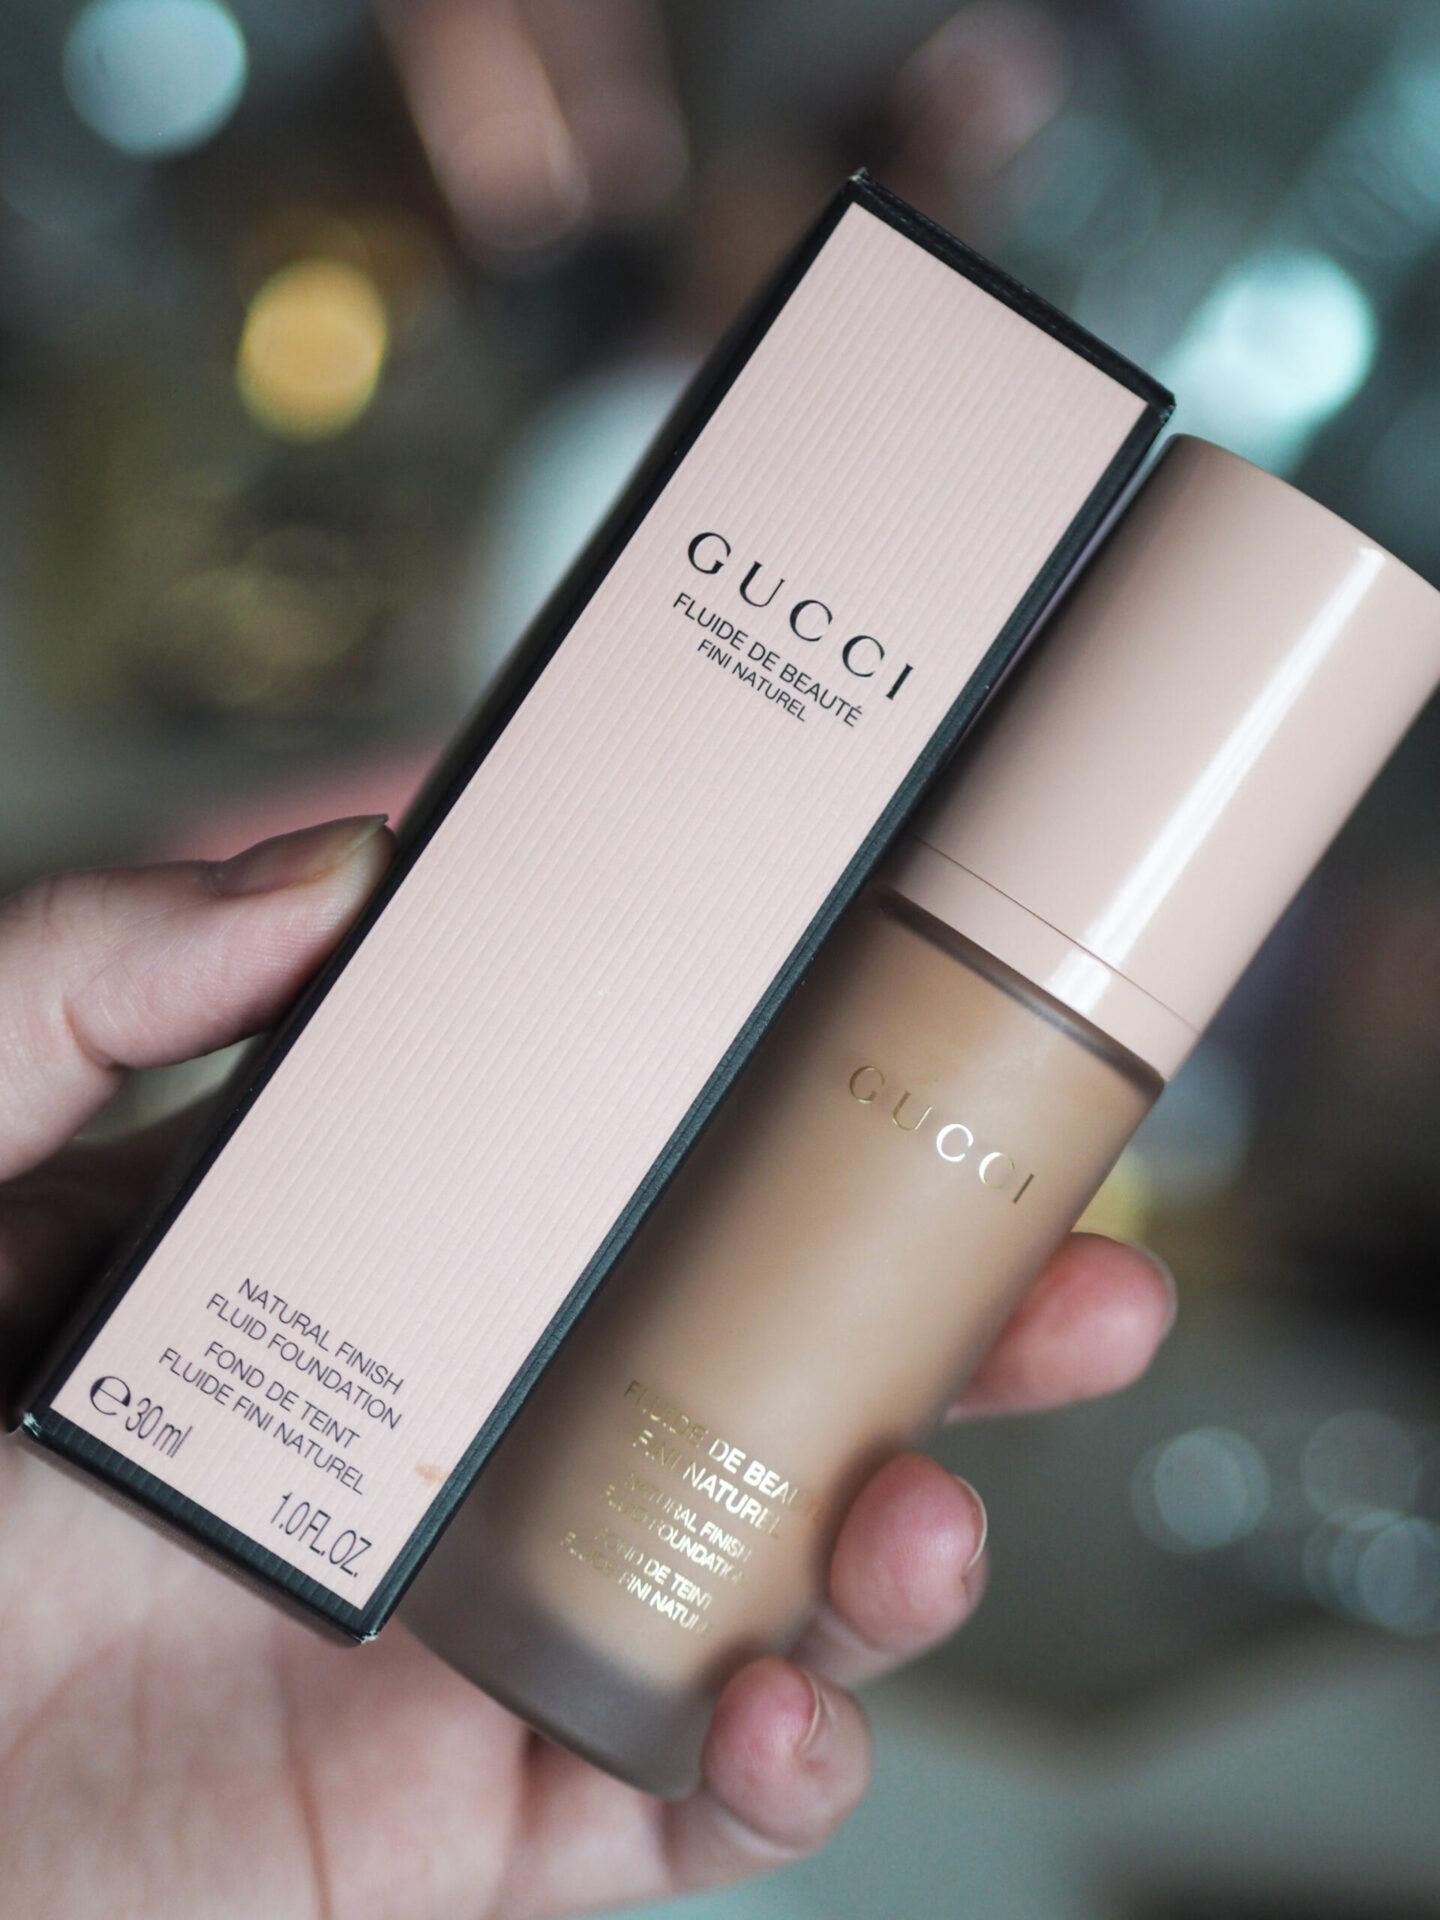 gucci foundation review gucci fluide de beaute fini natural